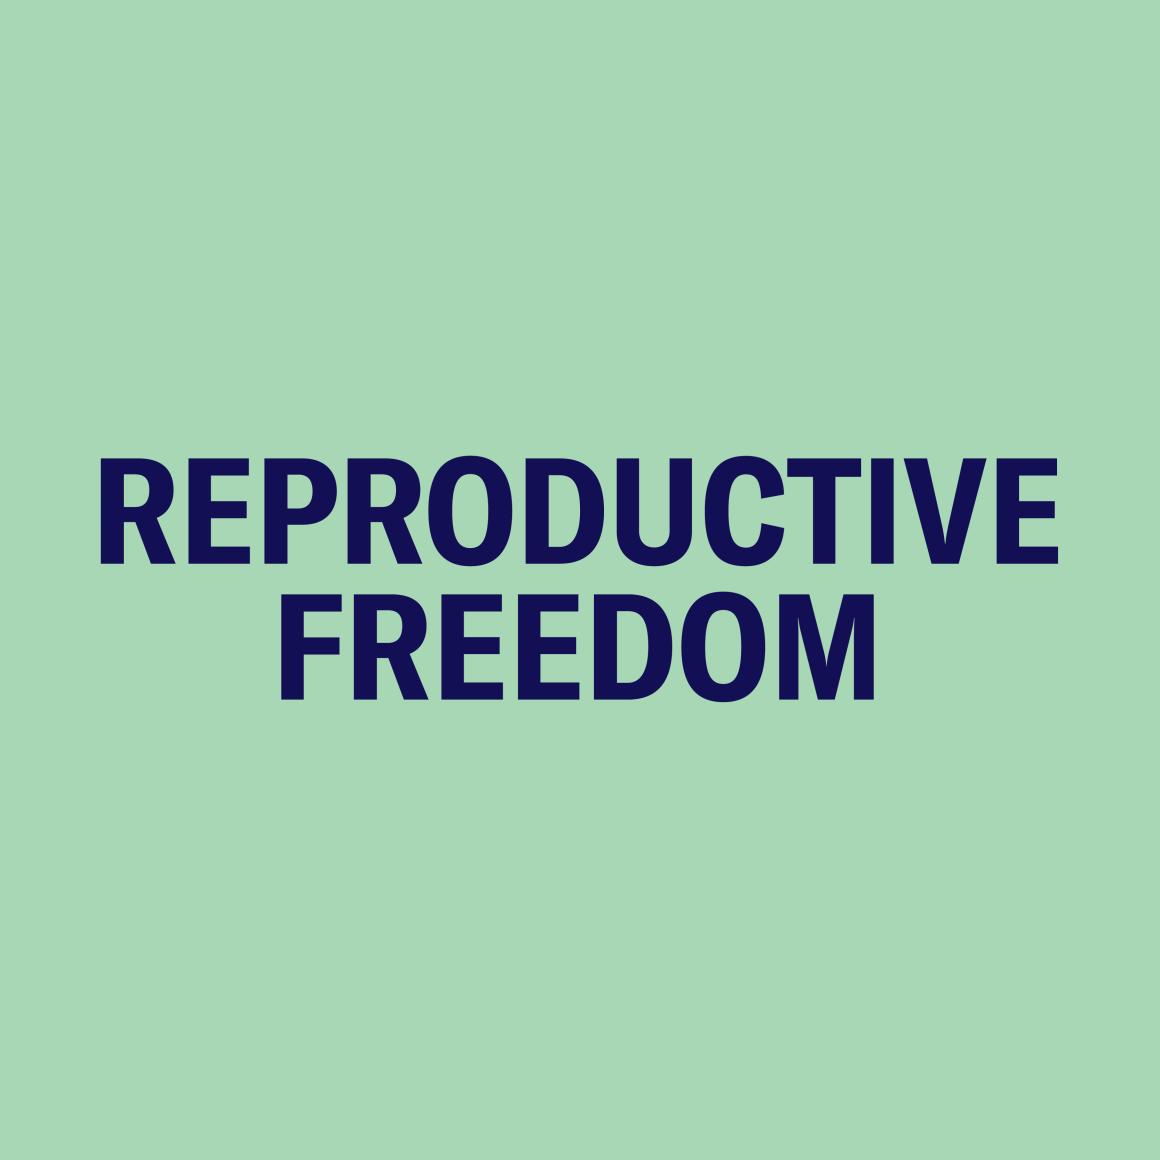 Repro Freedom